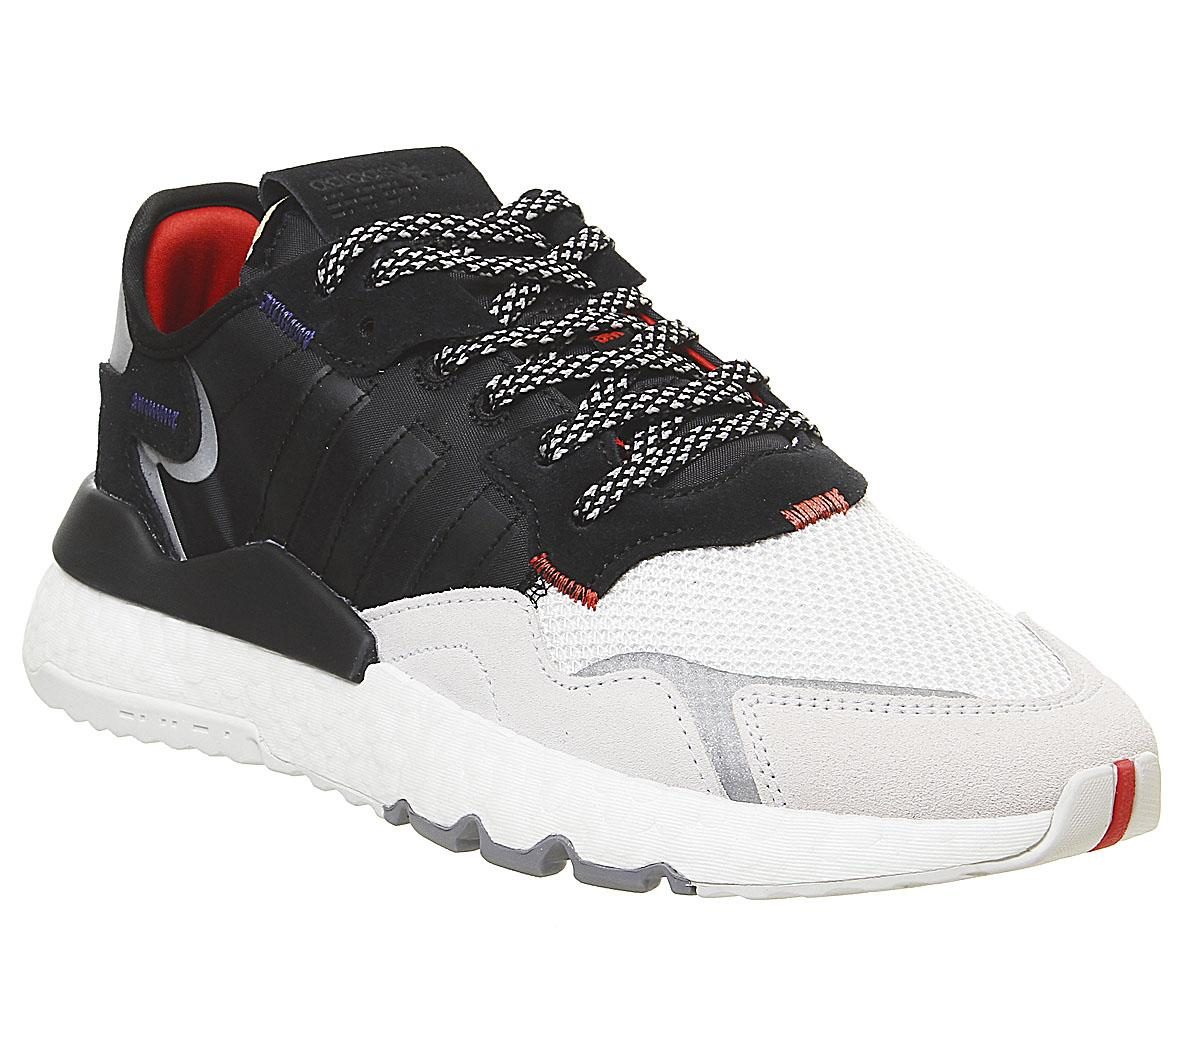 adidas Nite Jogger Boost Trainers Black